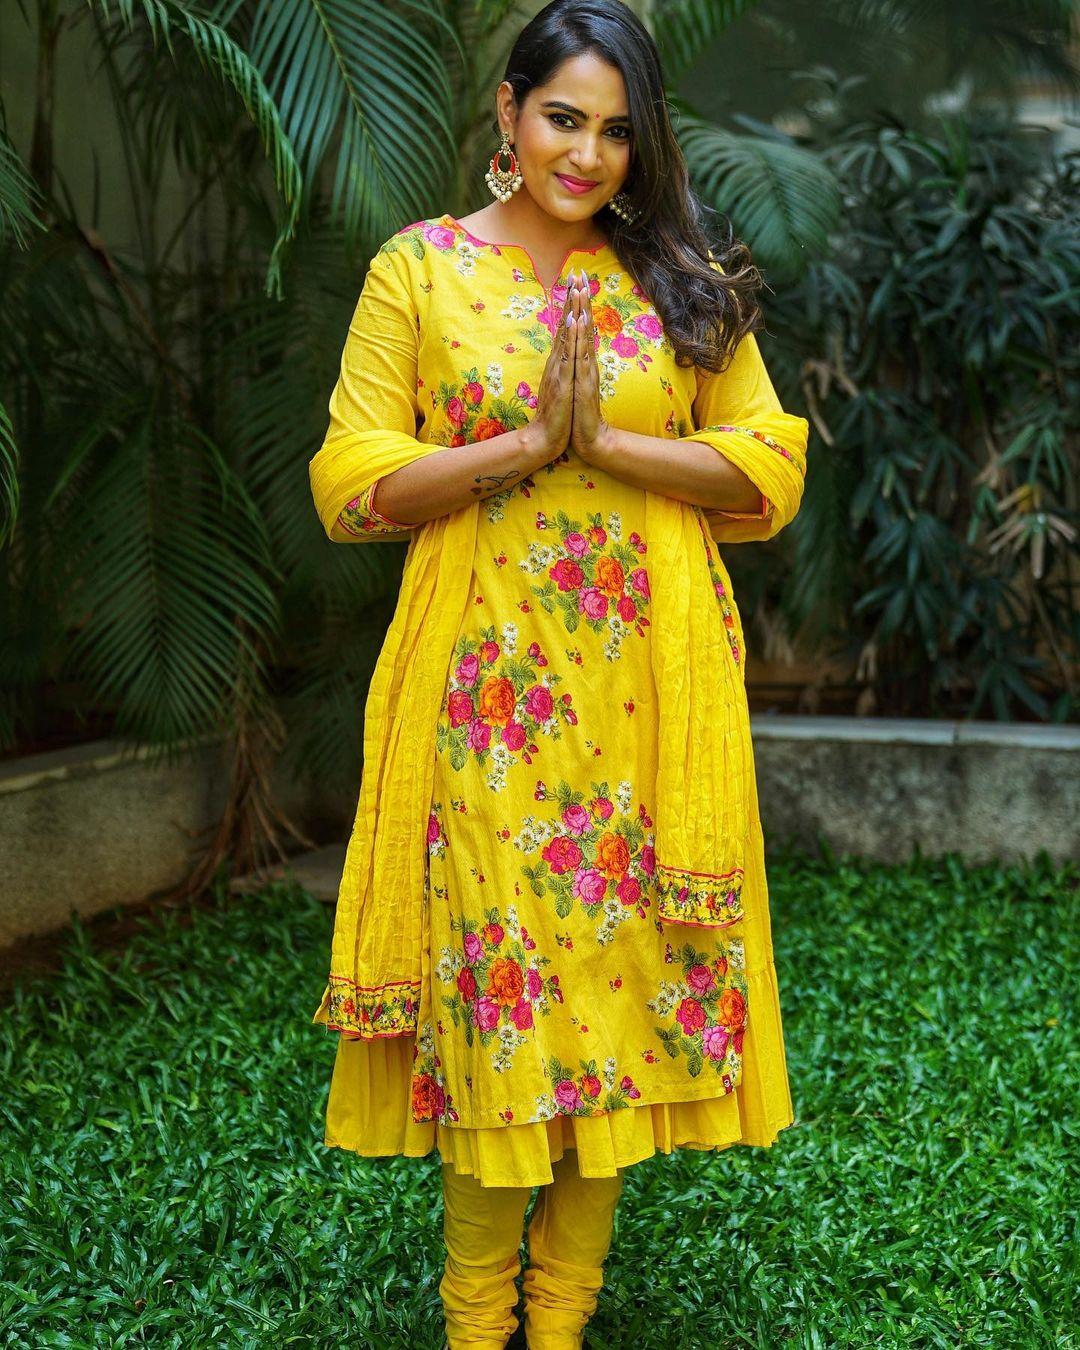 Beautiful actress Himaja in yellow color floral anarkali dress. 2021-04-14